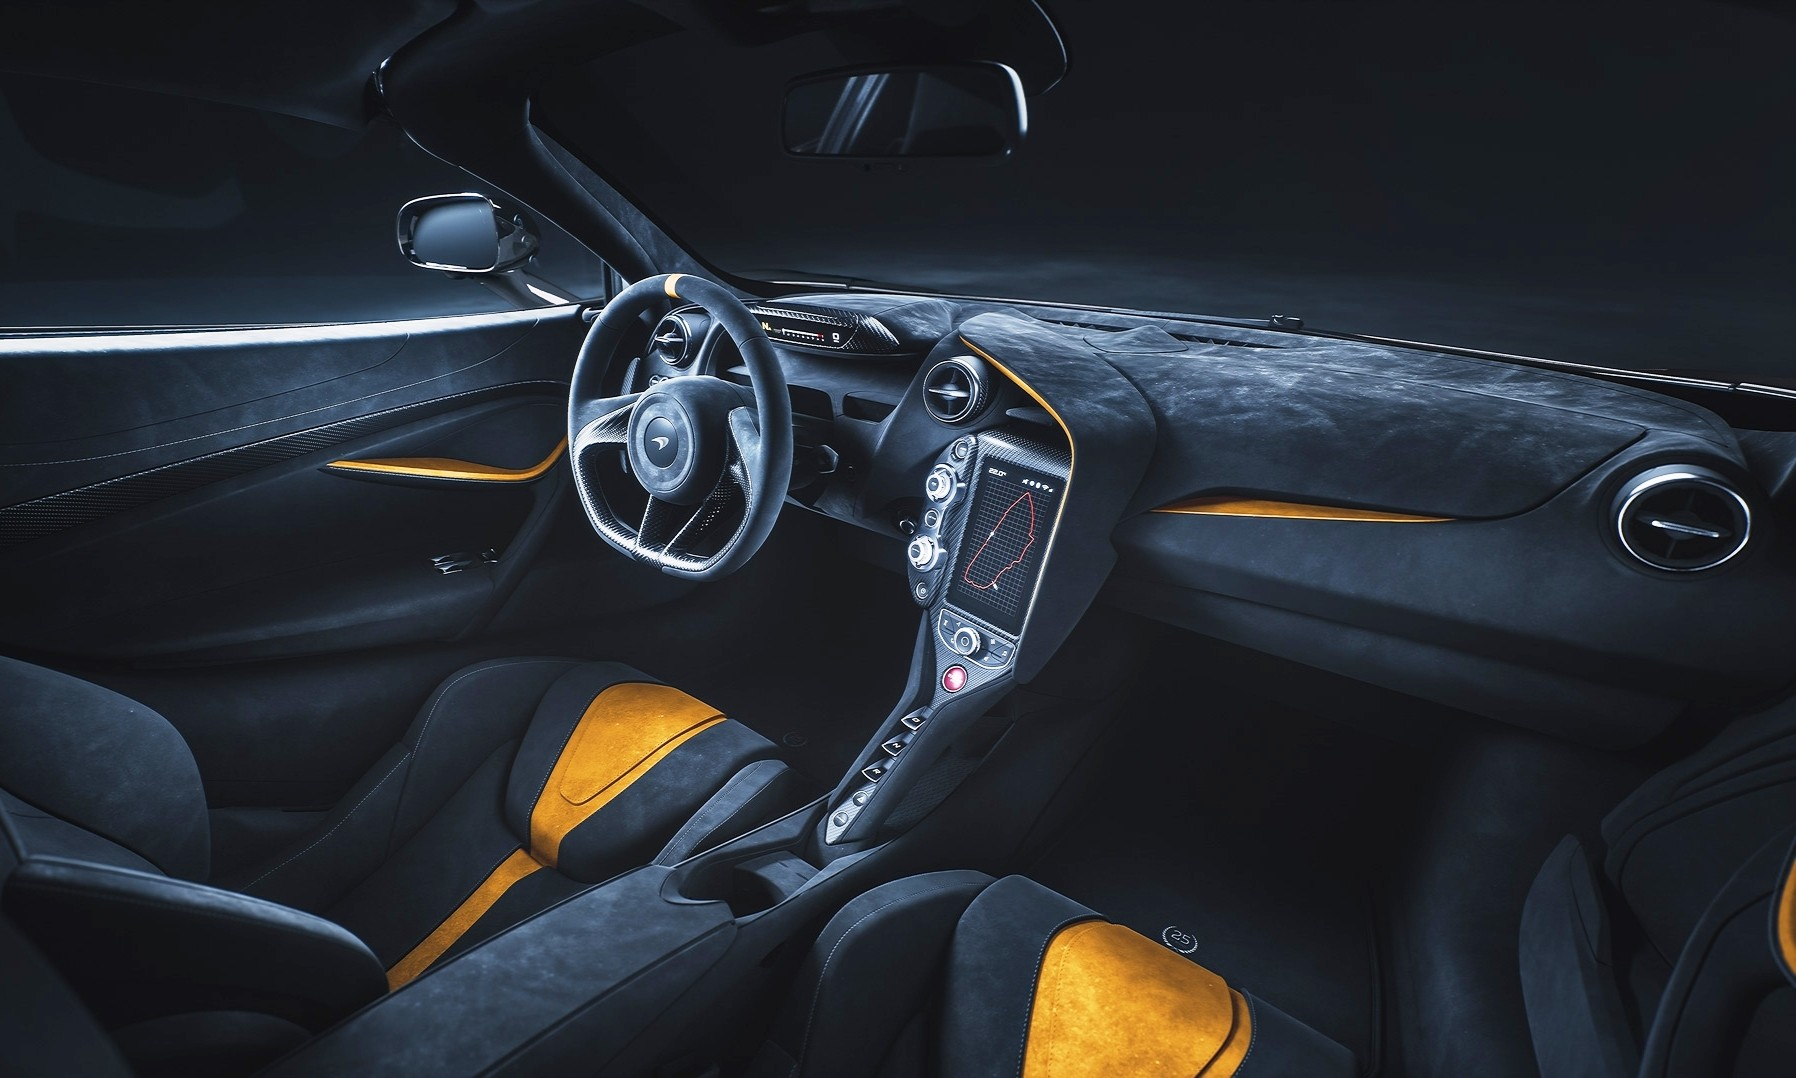 McLaren 720S Le Mans Edition interior